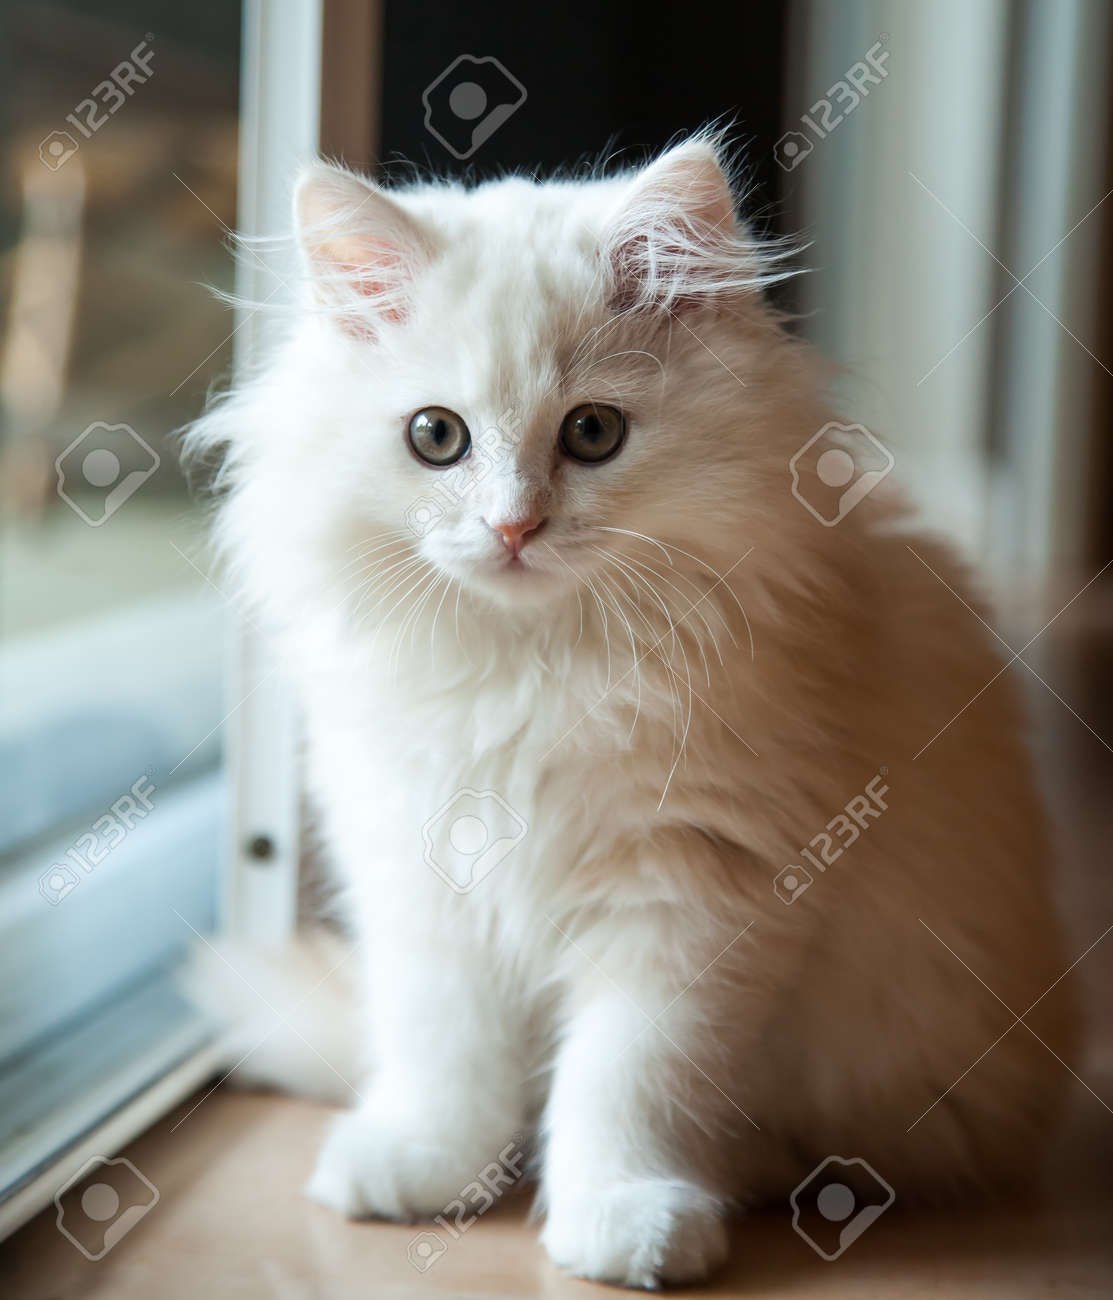 White long-haired pedigree kitten inside waiting at the door Stock Photo - 25831341 & White Long-haired Pedigree Kitten Inside Waiting At The Door Stock ...